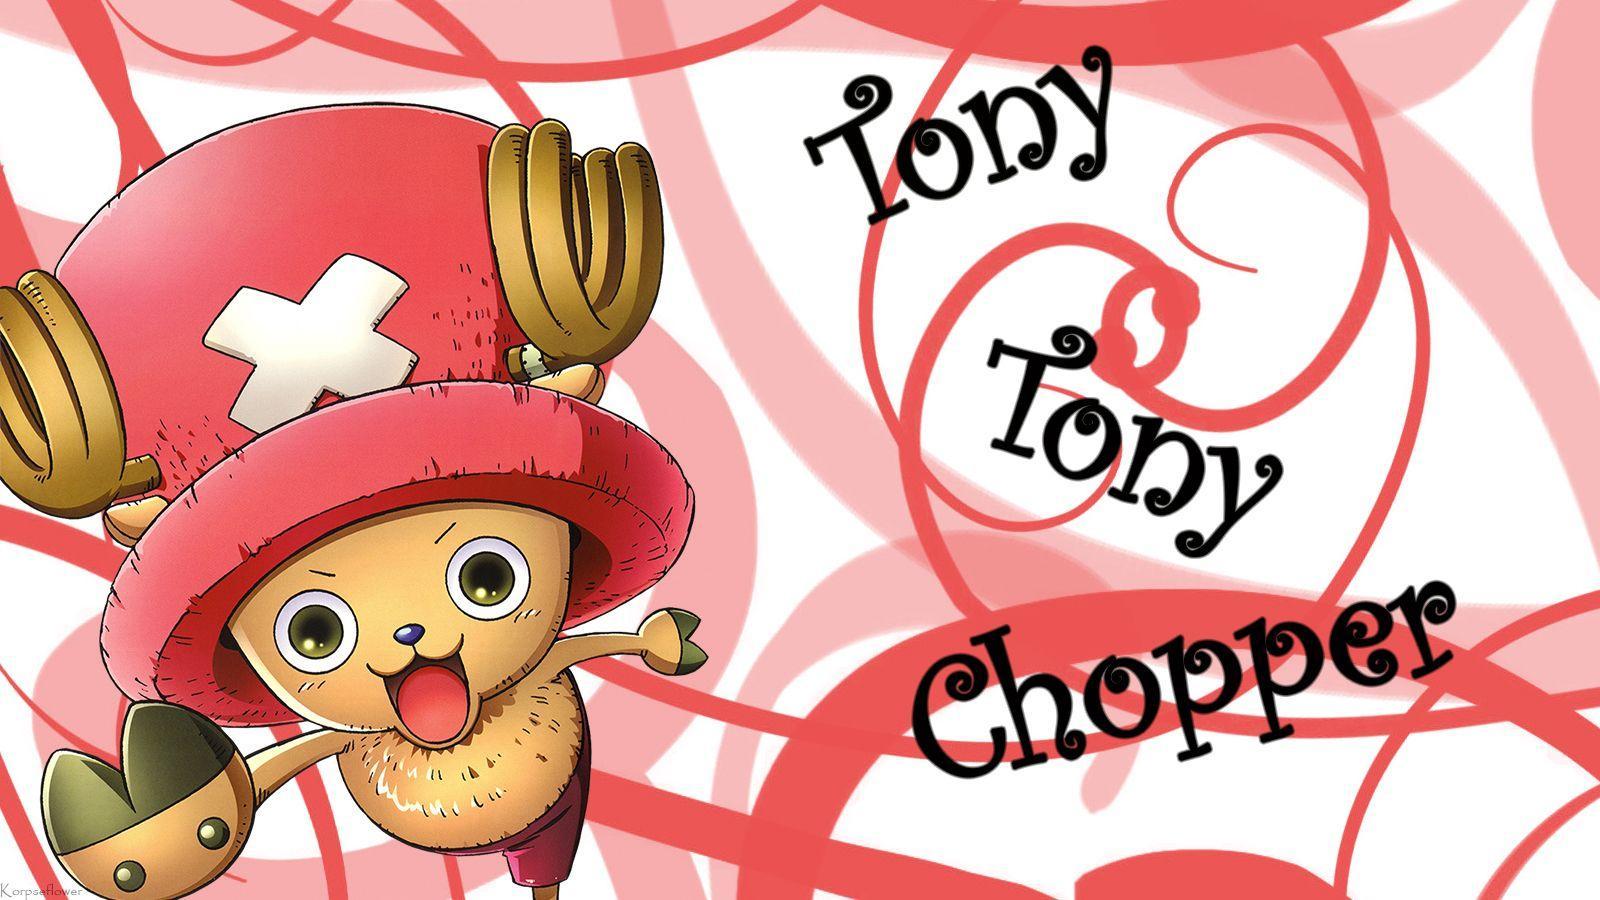 Tony Chopper Wallpapers Top Free Tony Chopper Backgrounds Wallpaperaccess